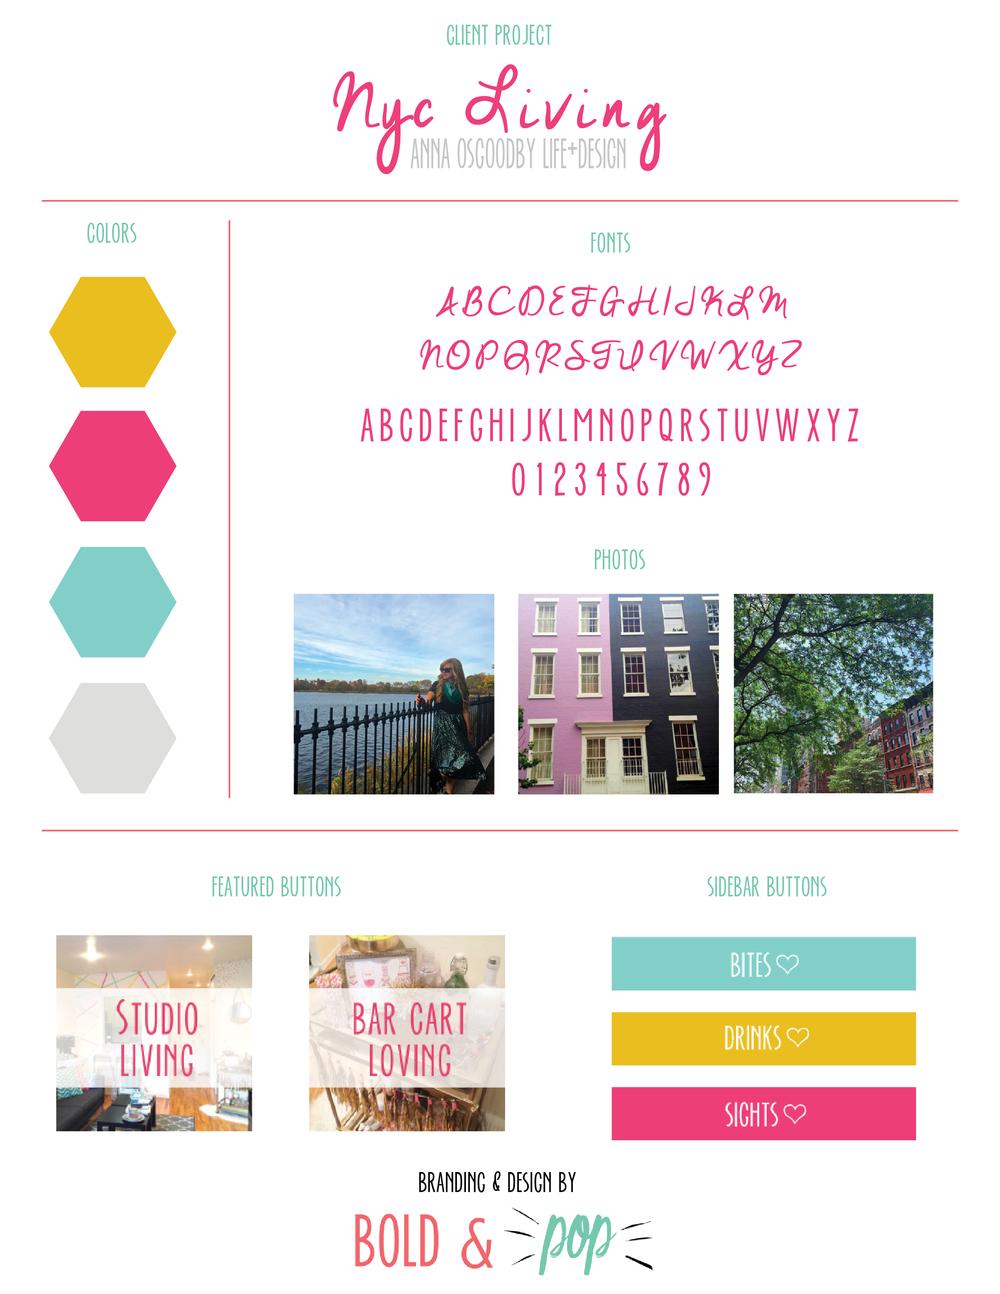 Bold & Pop :: NYC Living Lifestyle Blog Website Squarespace Design